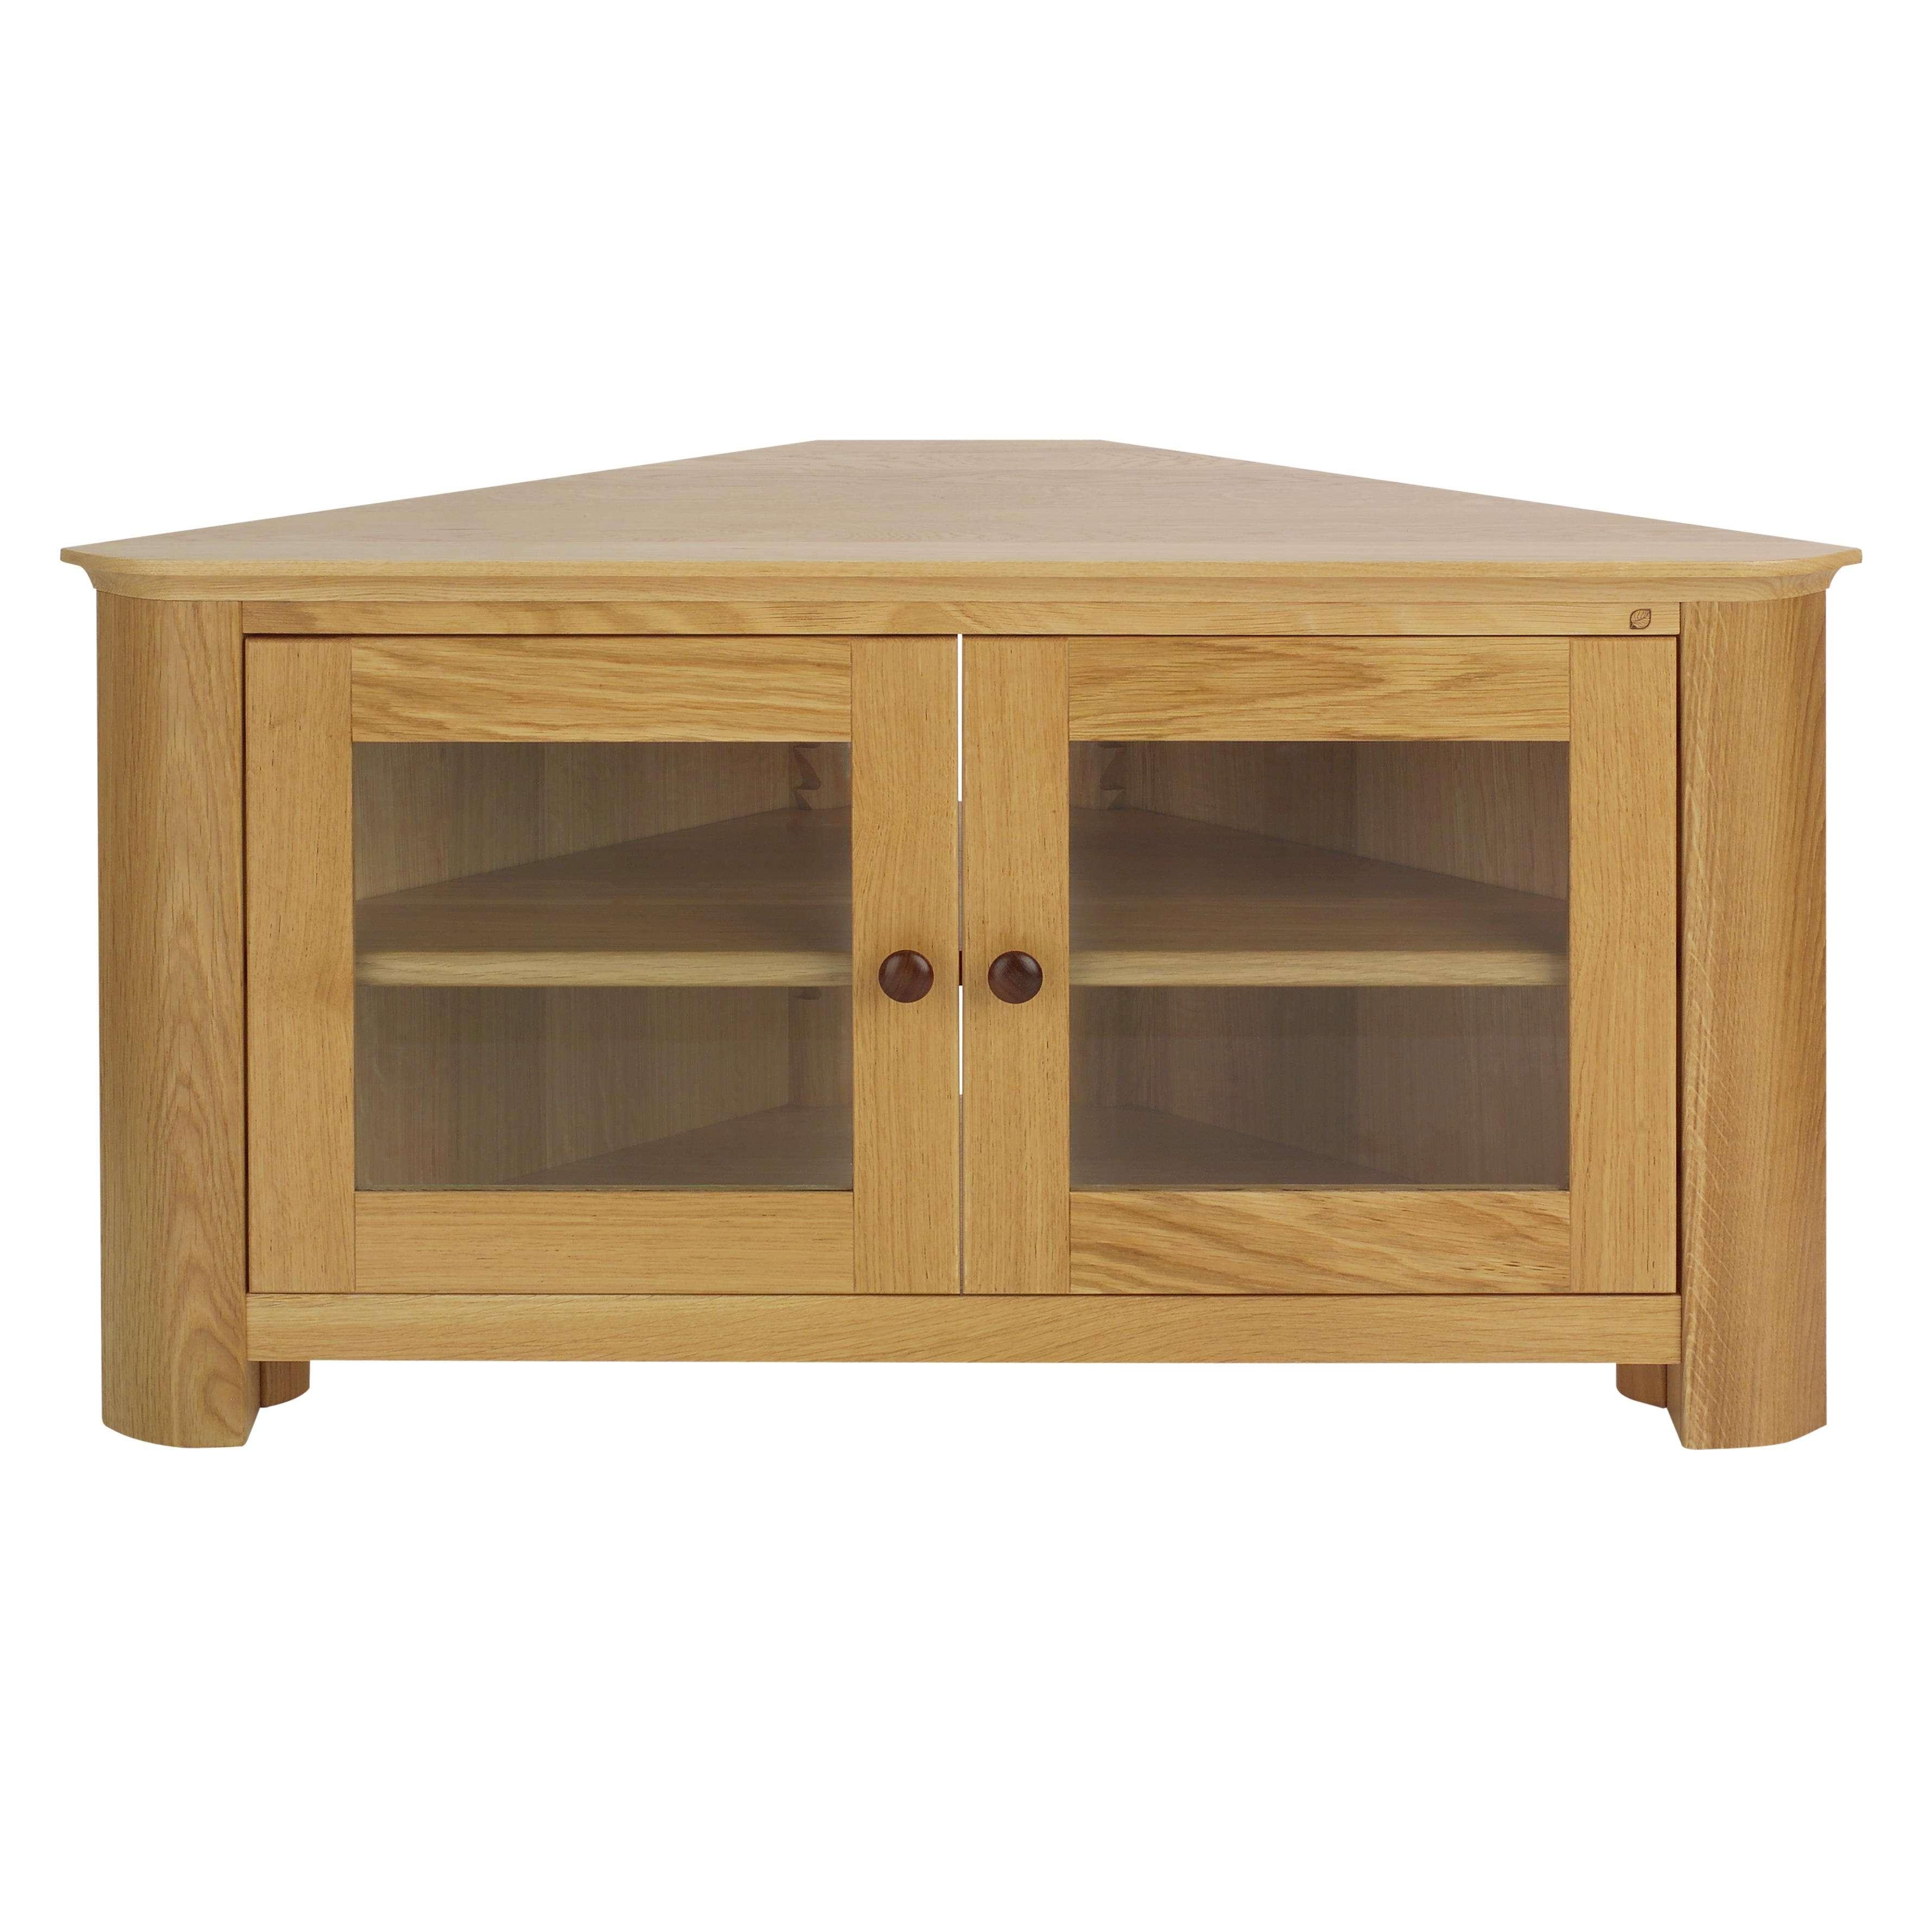 Uncategorized: Best Corner Tv Stand Ikea Tv Stands Argos, Tv Bench Inside Small Oak Corner Tv Stands (View 9 of 15)